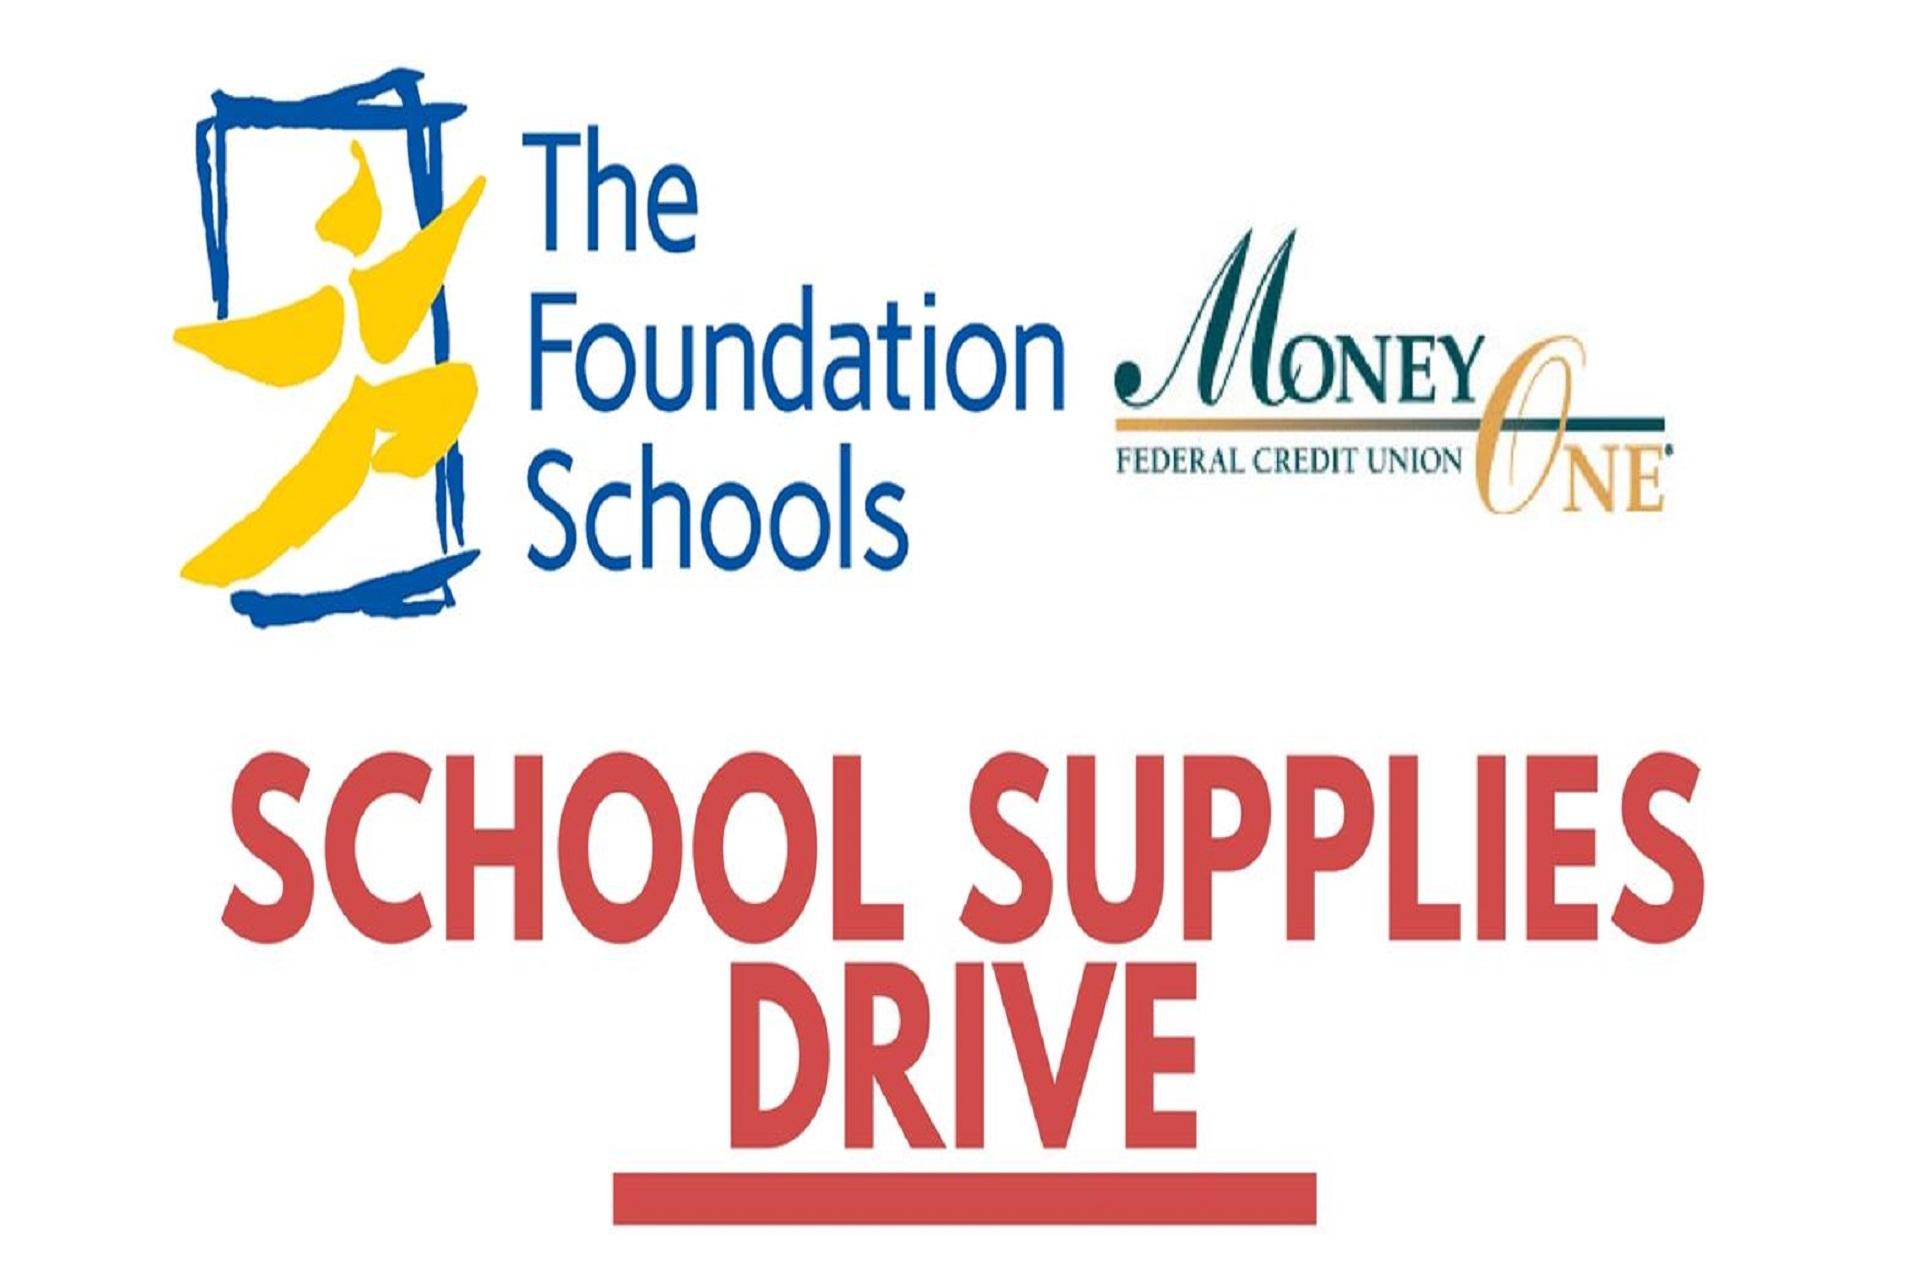 schoolsuppliesdrive Logo